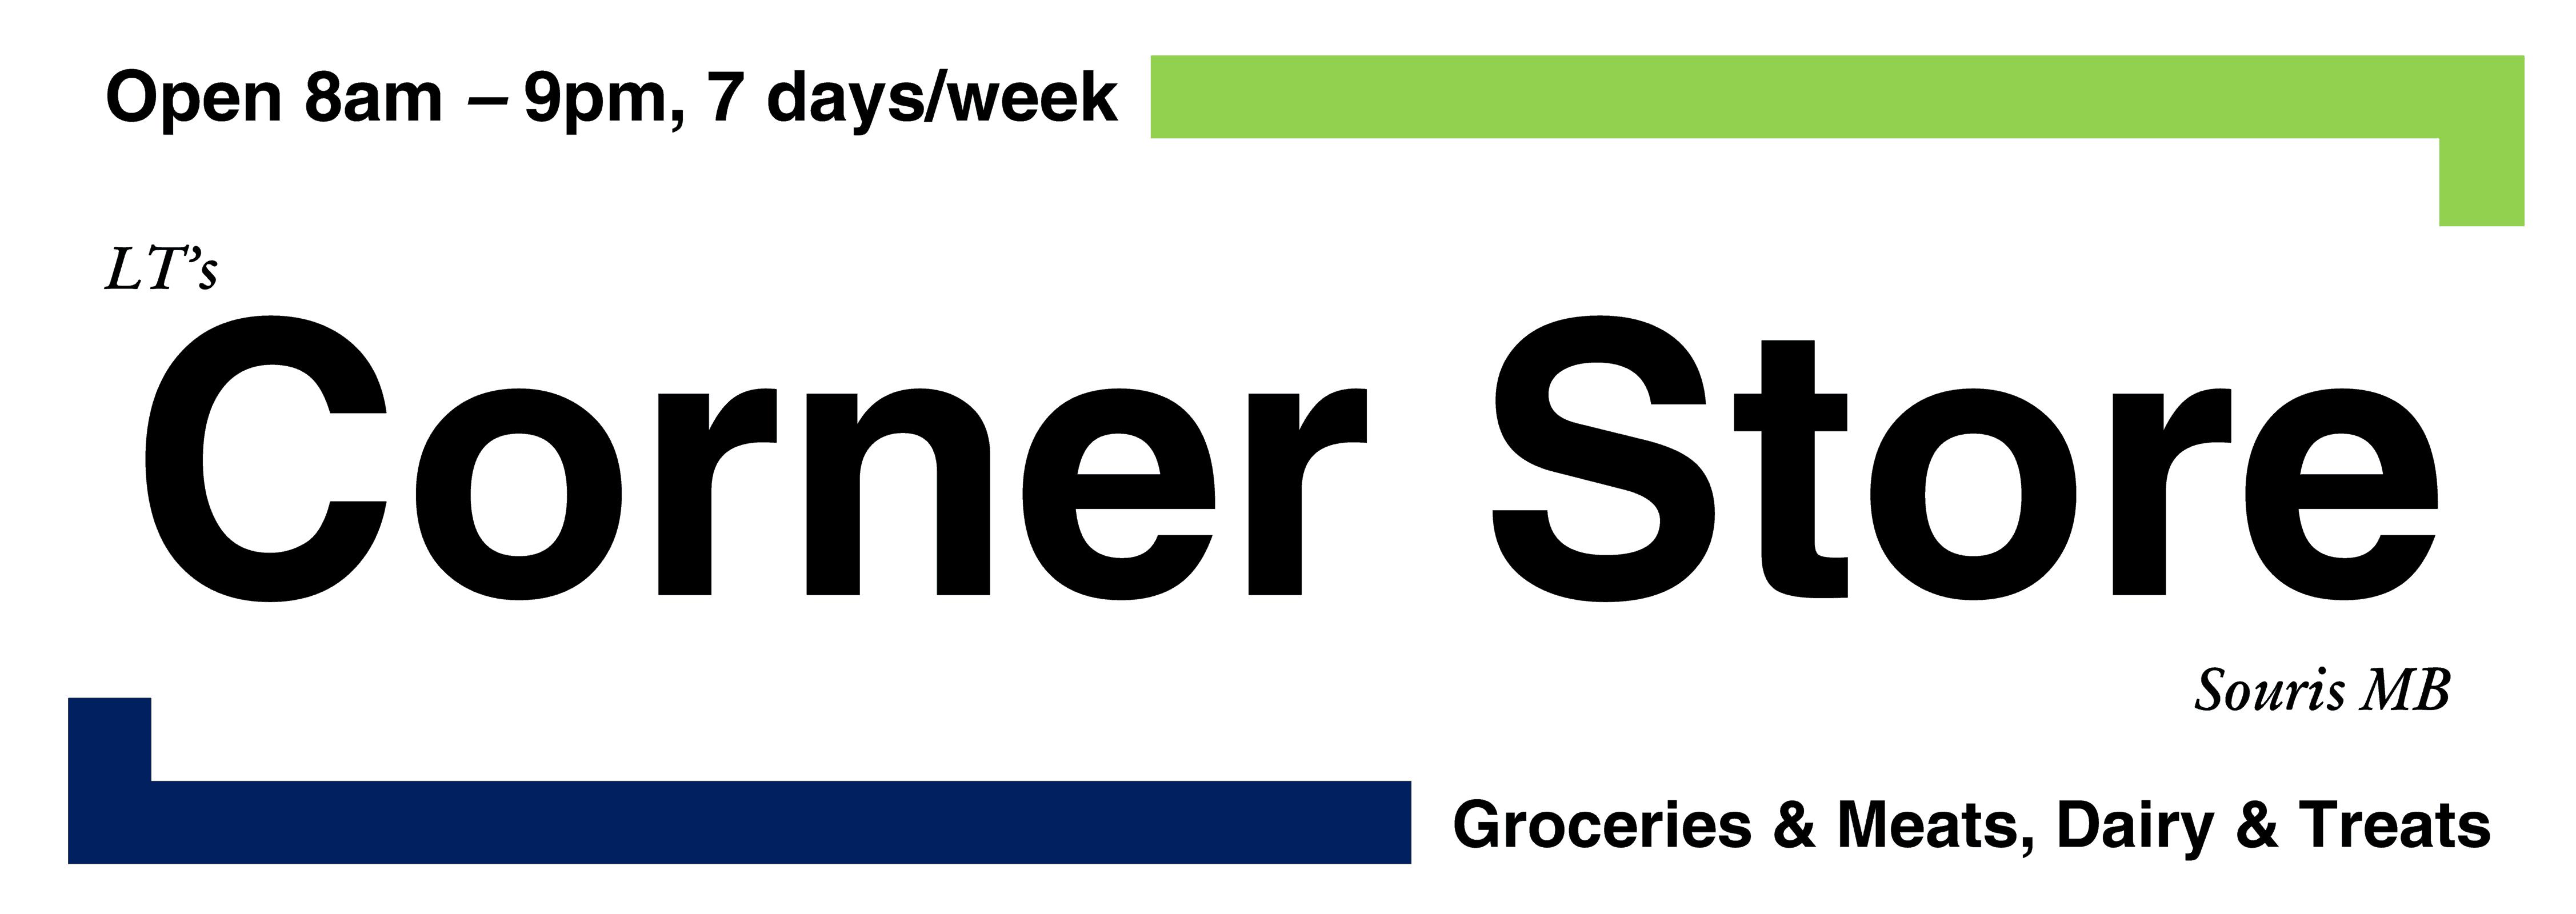 LT's Corner Store